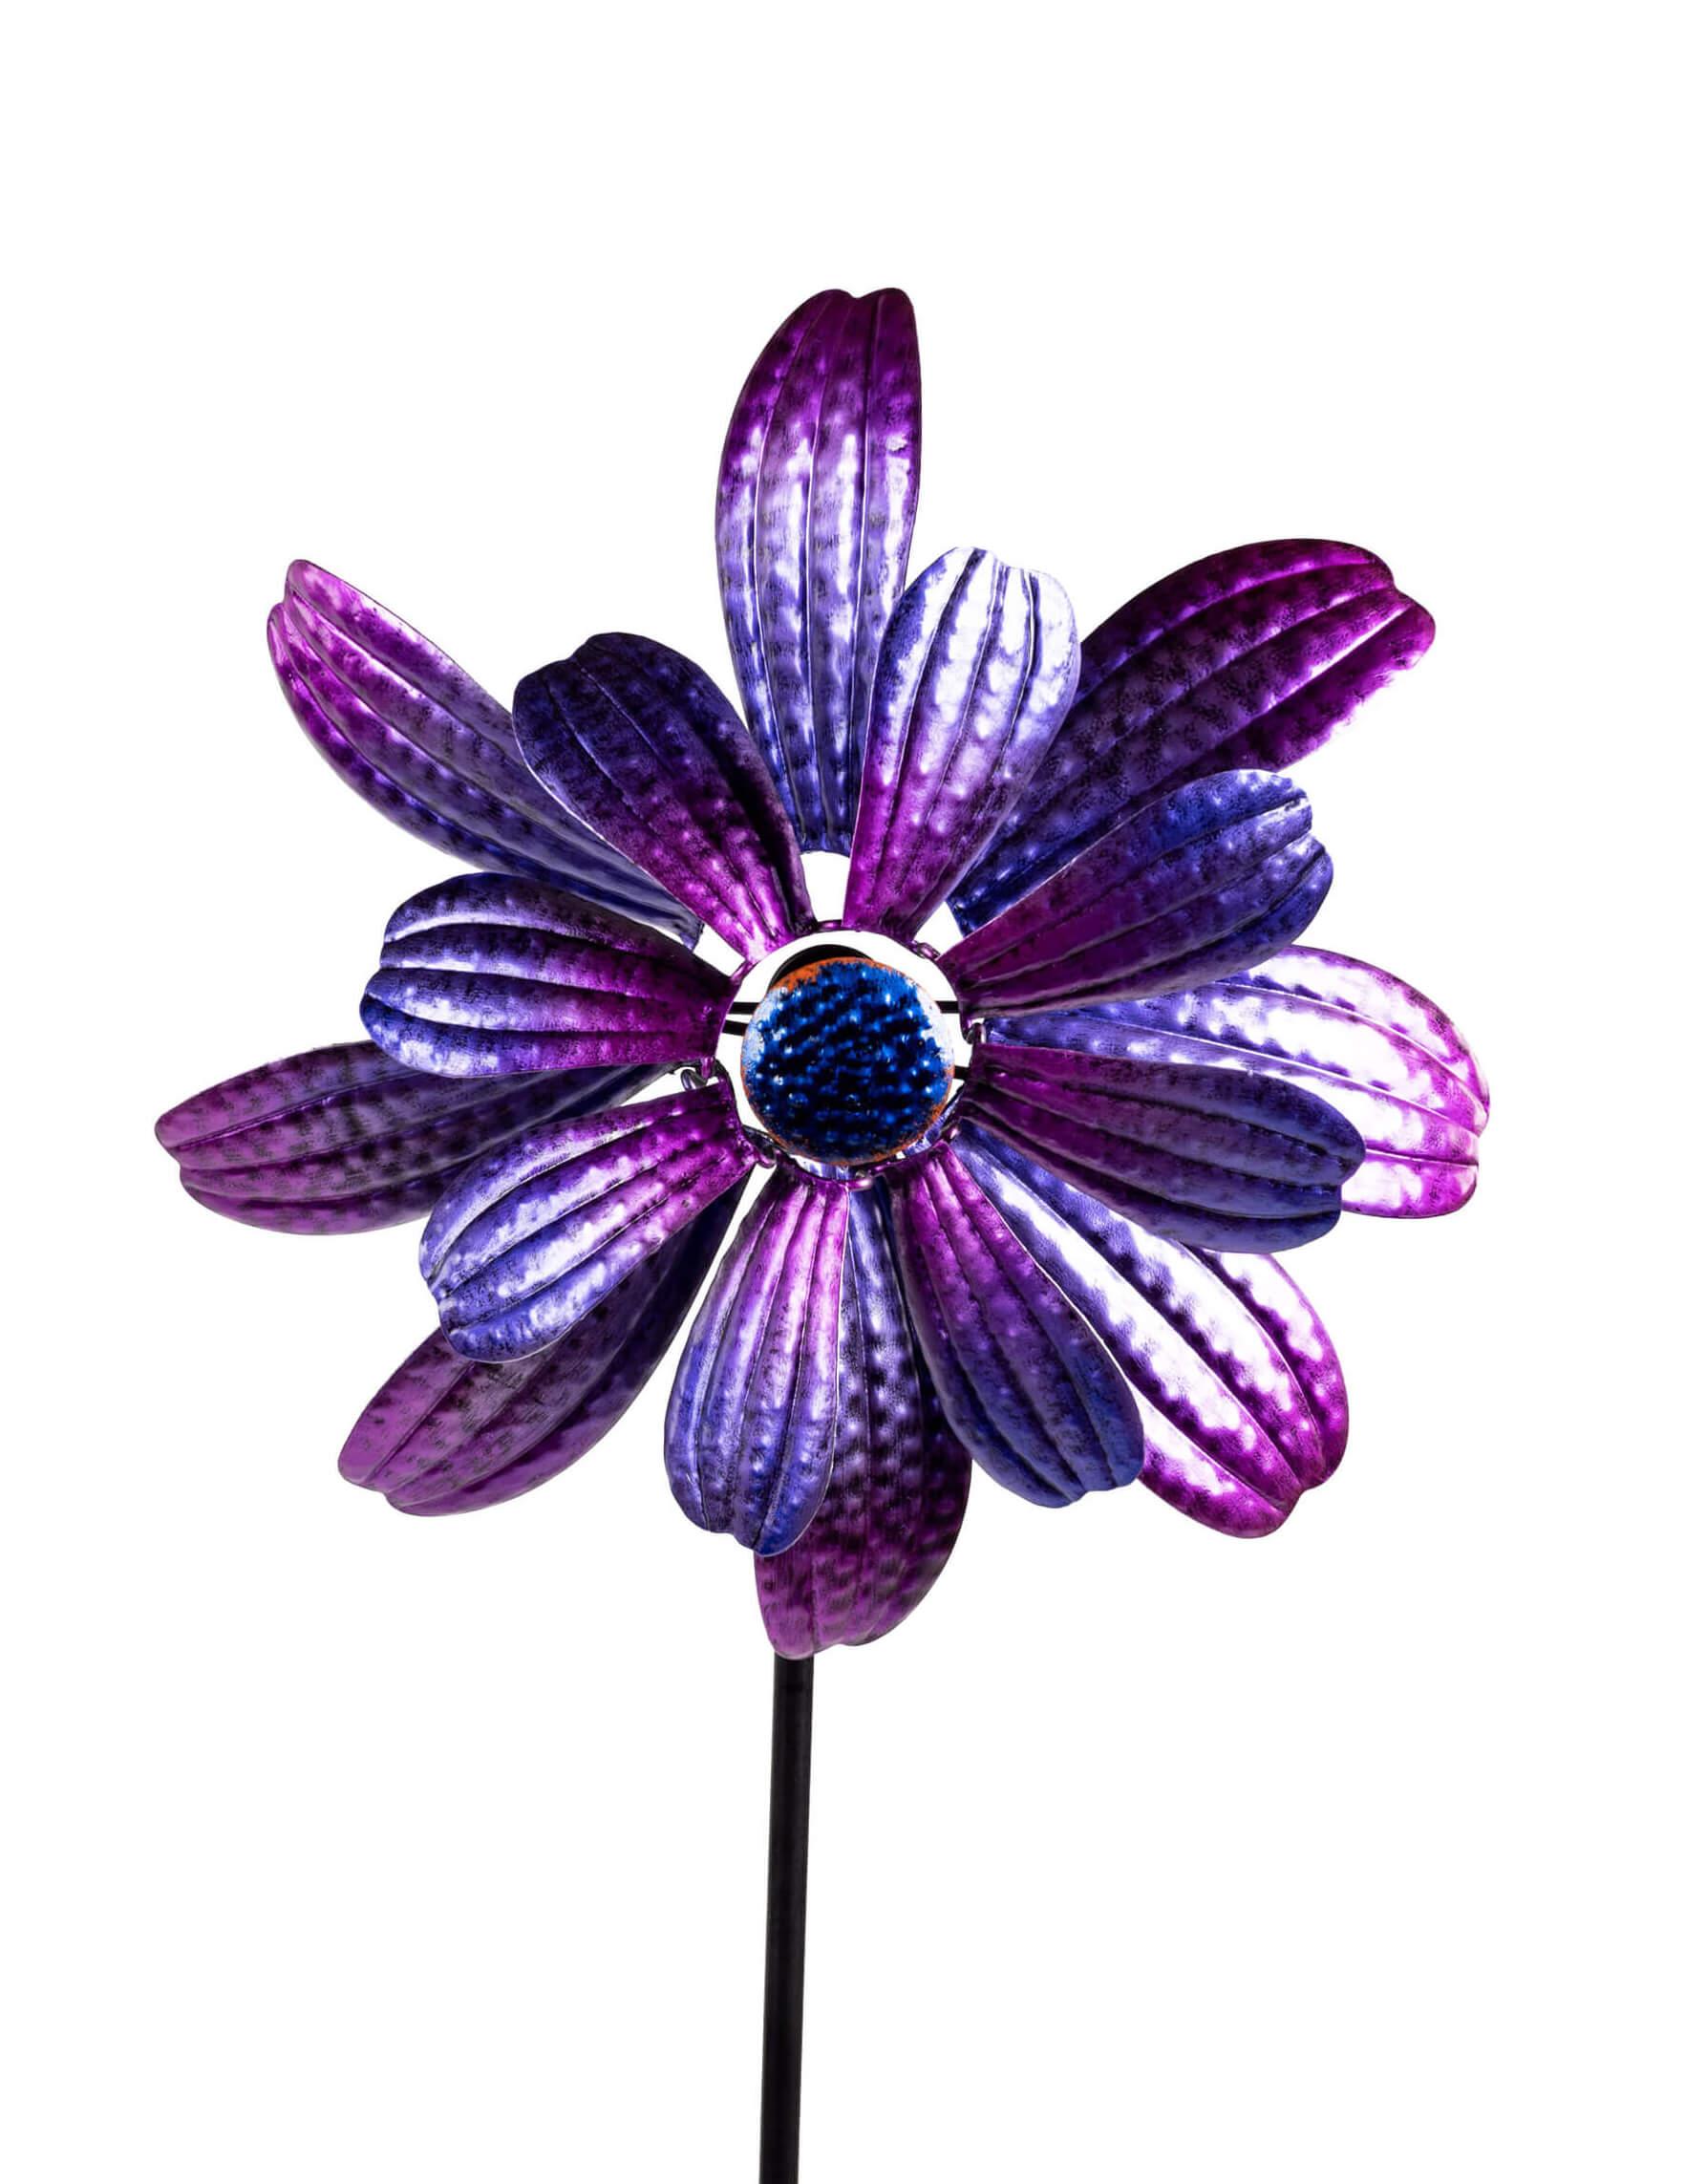 Windrad ZARTE Blume Windspiel 134 cm, Lila Metall, Gartenstecker